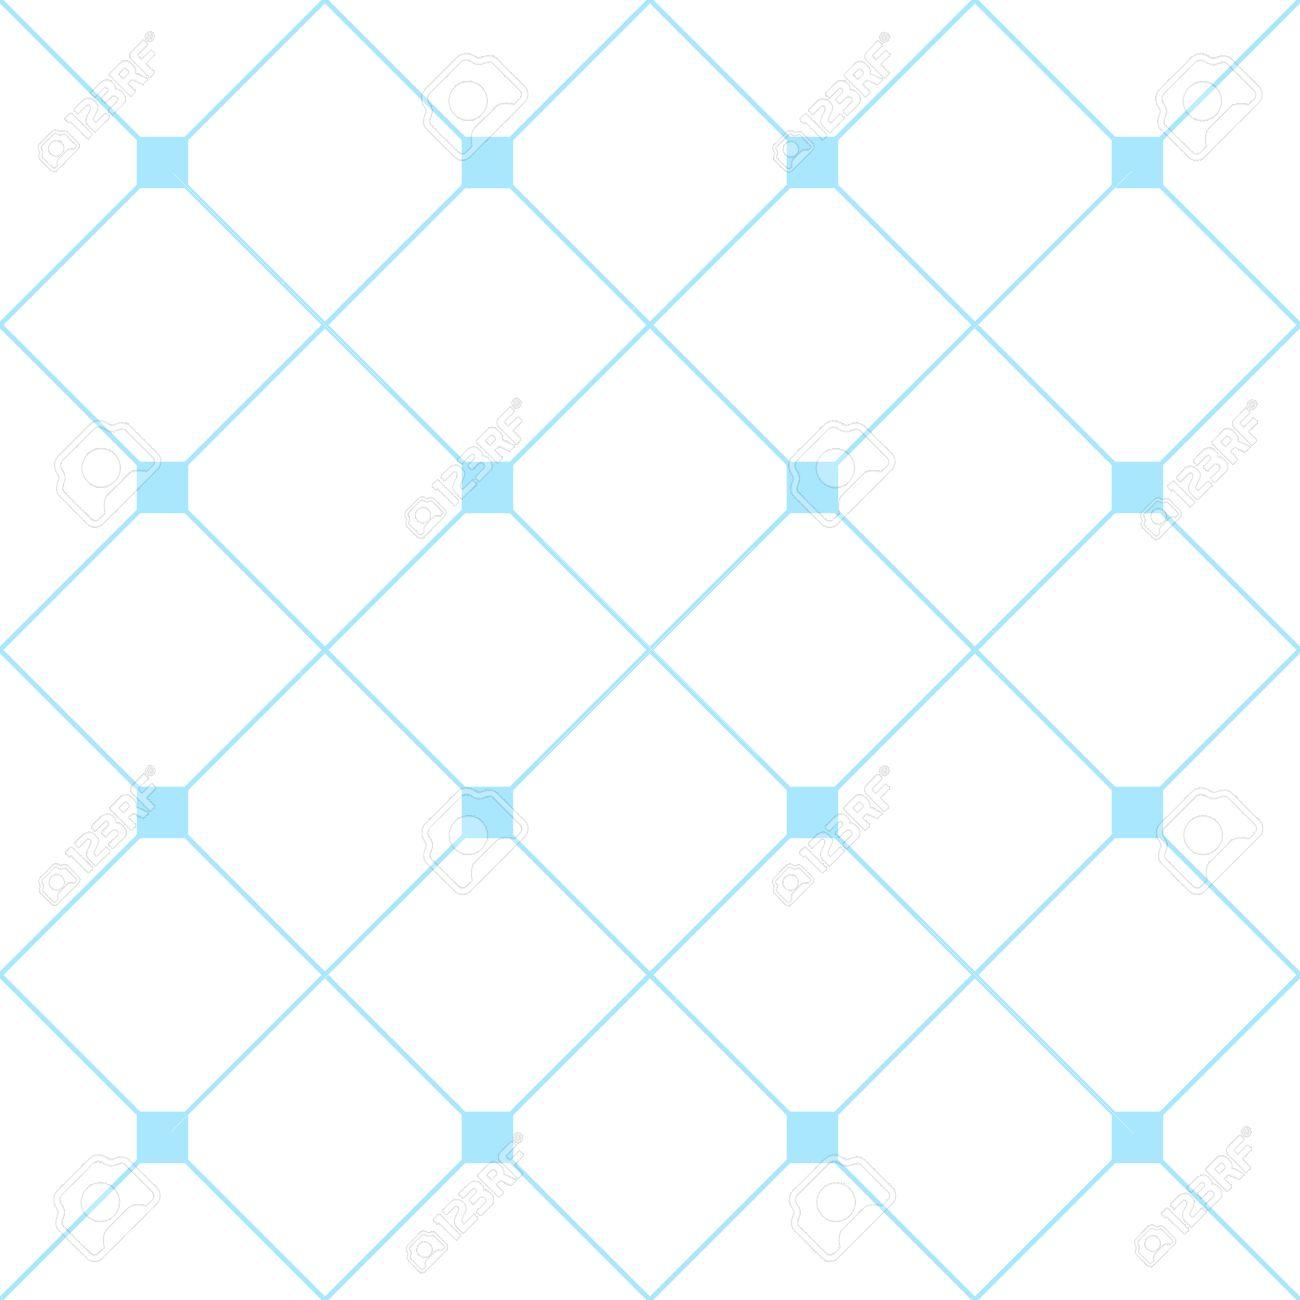 Light Blue Square Diamond Grid White Background Classic Minimal Pattern Texture Illustration Stock